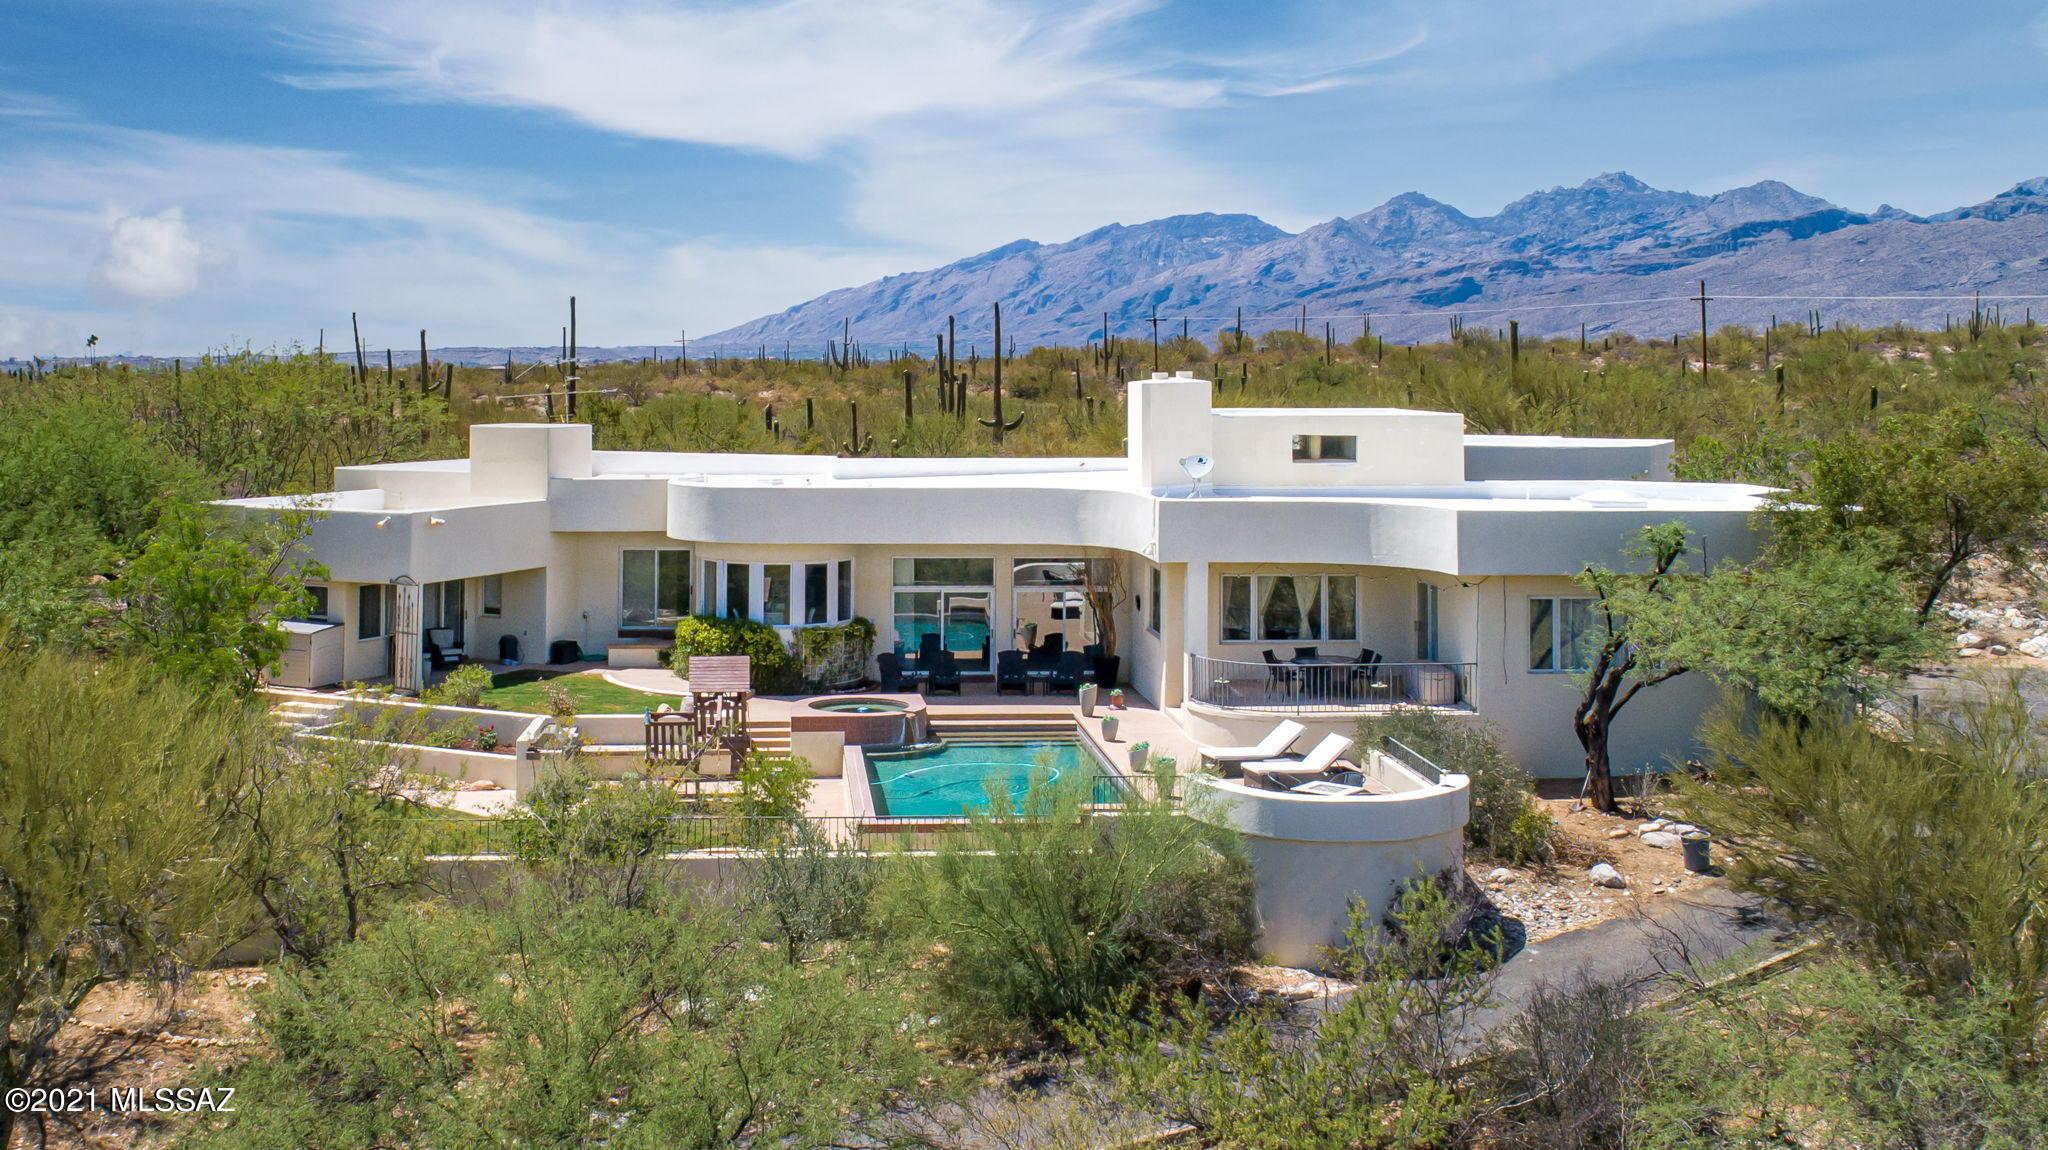 Photo of 13005 E Cape Horn Drive, Tucson, AZ 85749